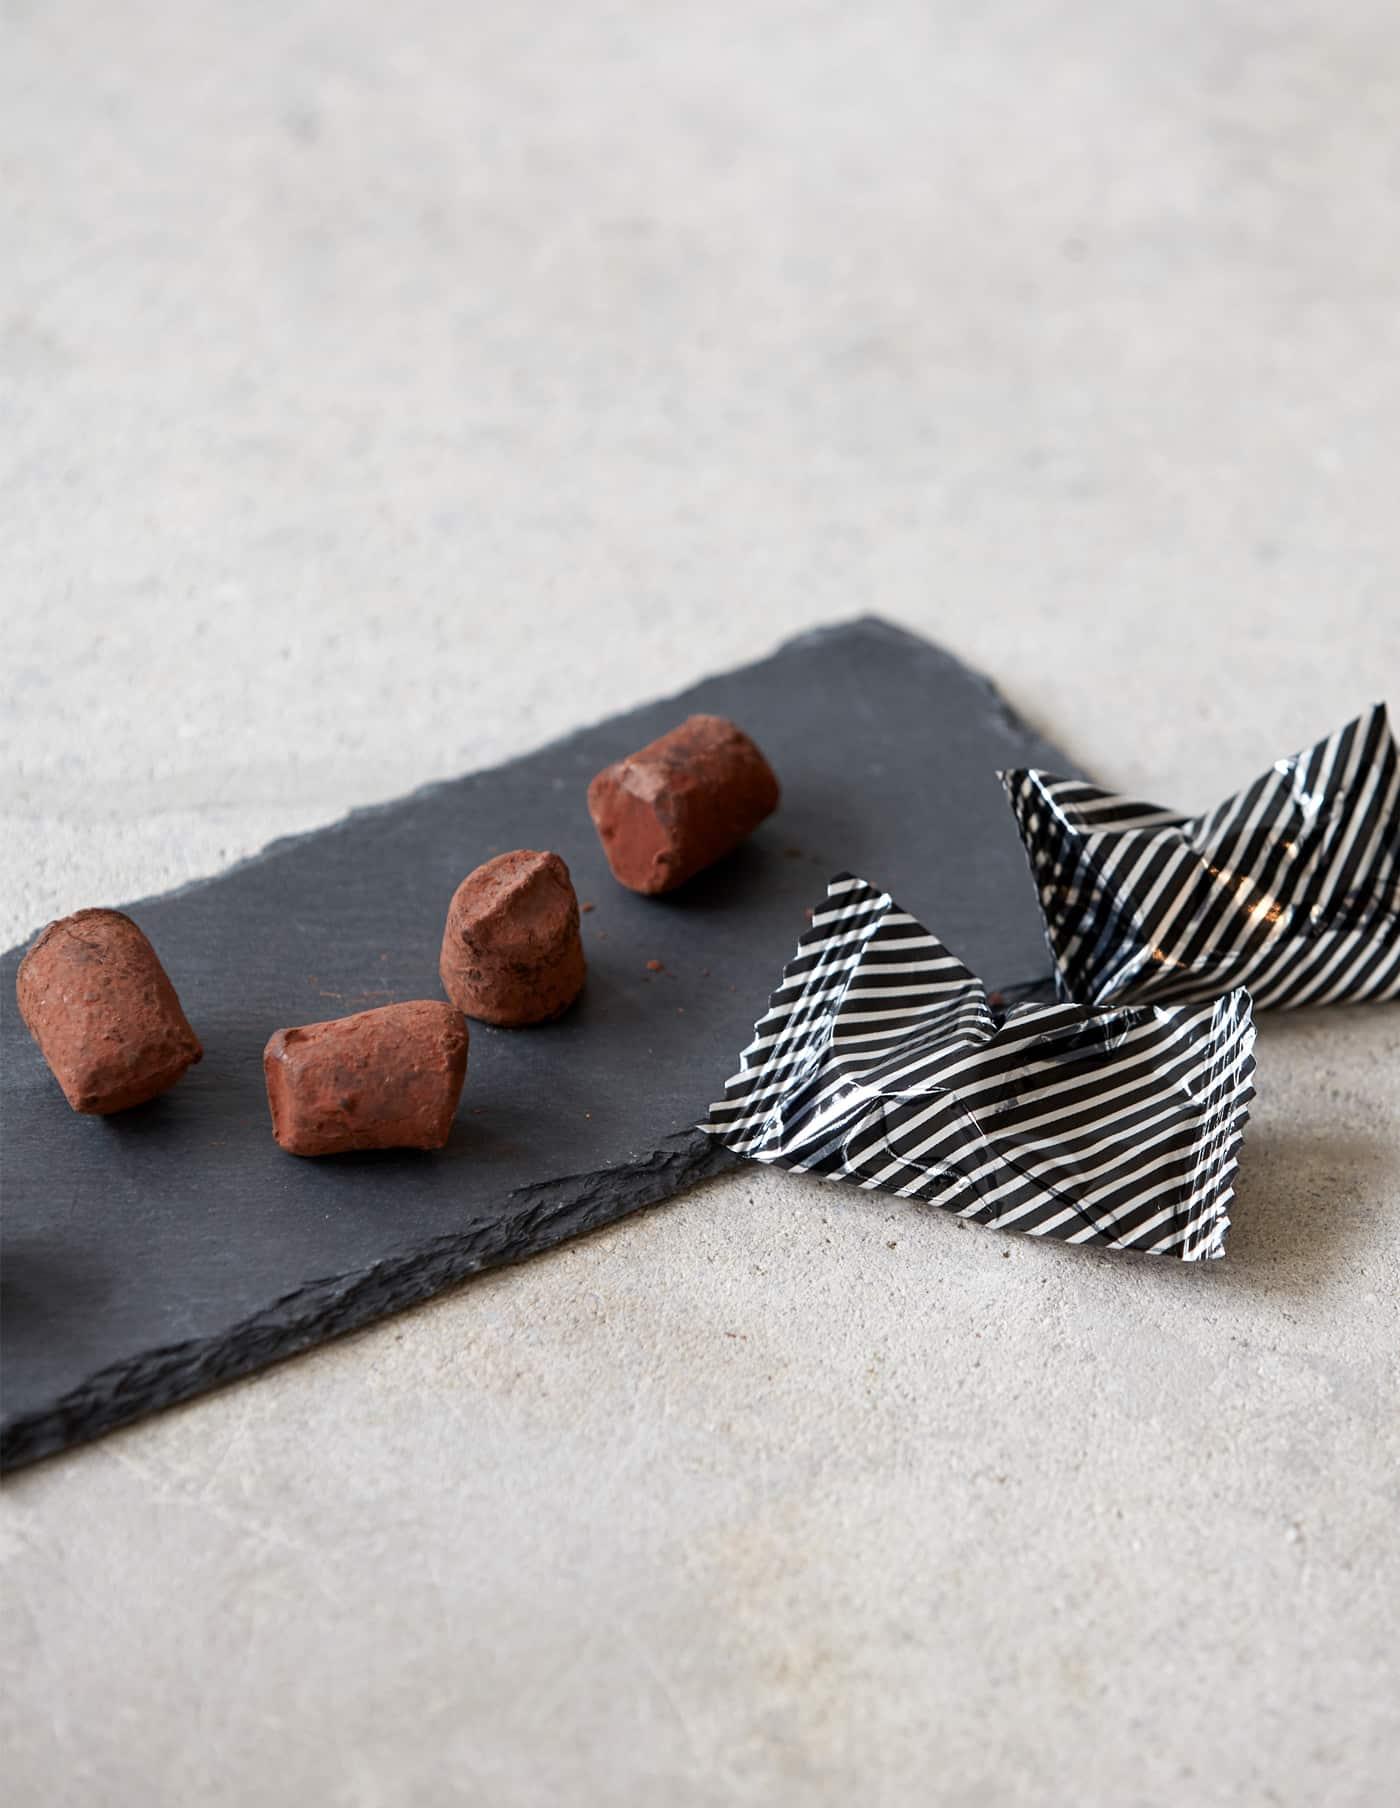 Pistachio & Crunch Chocolate Truffles